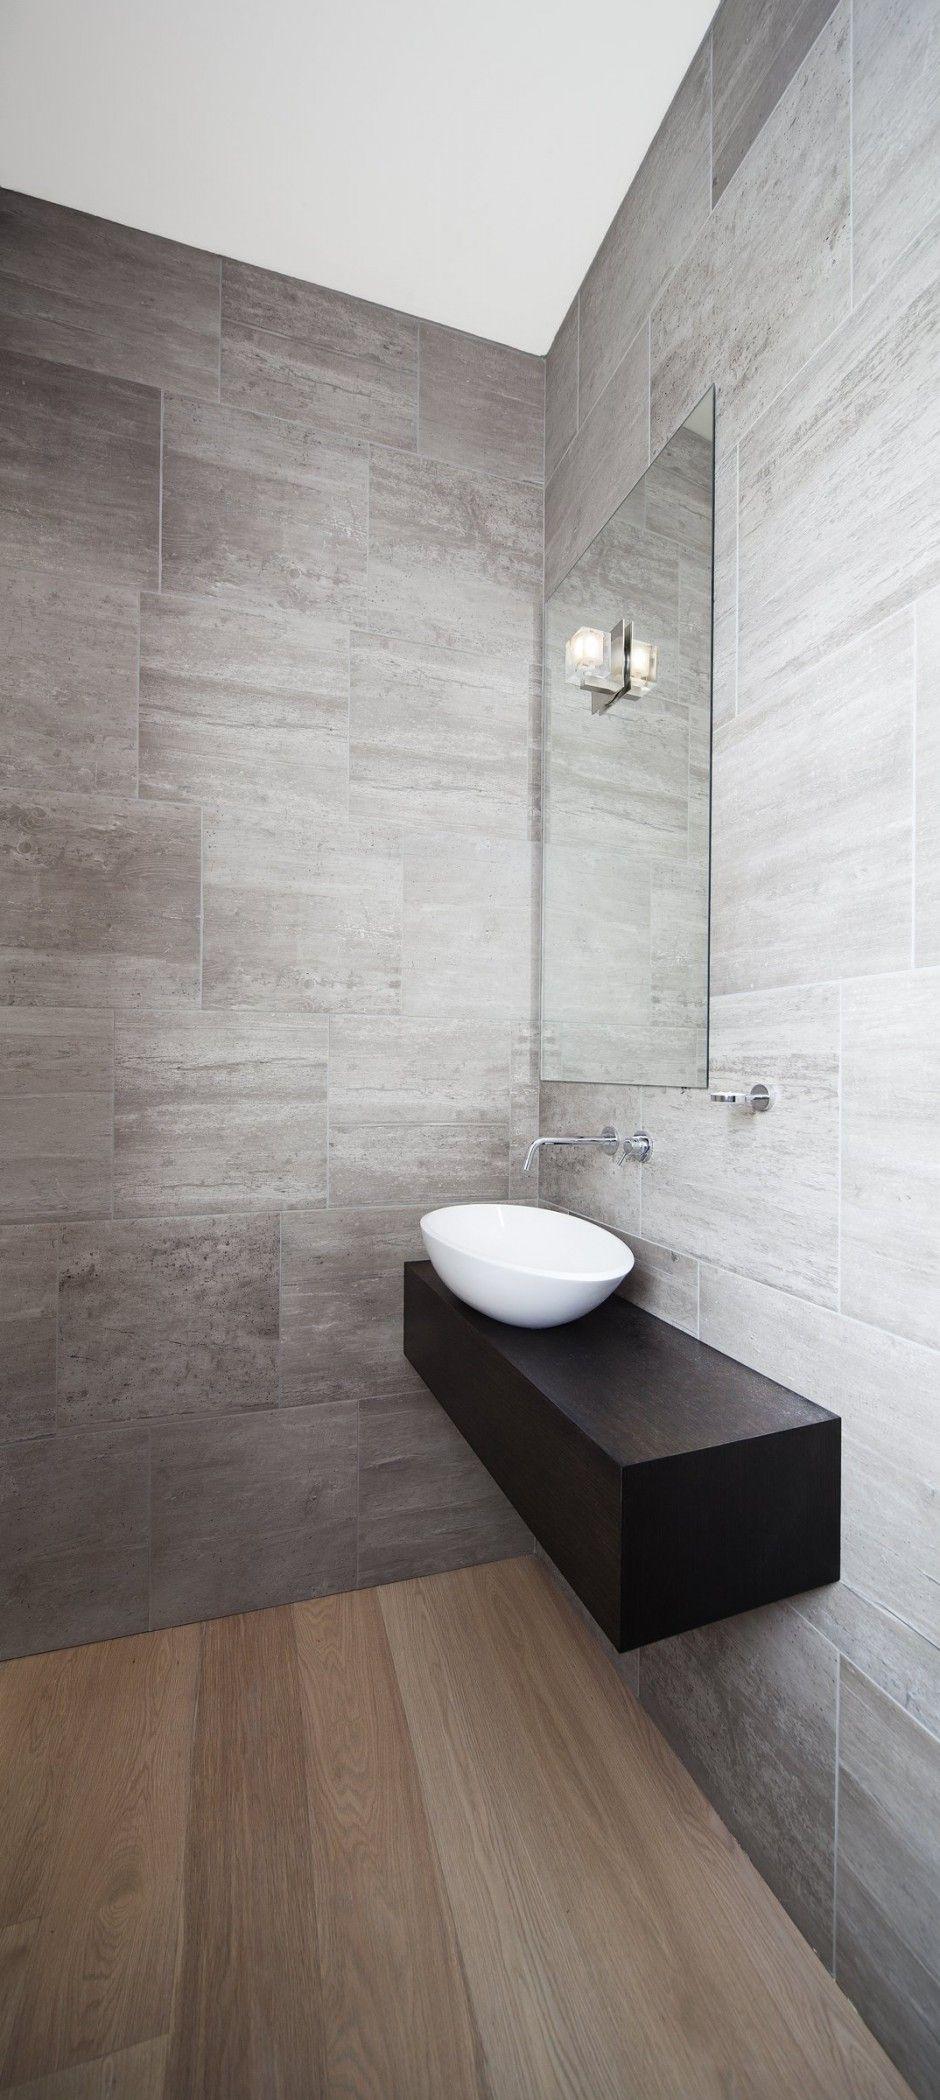 Minimalistic Sink Black And White Westboro Home By Kariouk Associates Bad Fliesen Designs Bad Inspiration Badezimmer Innenausstattung